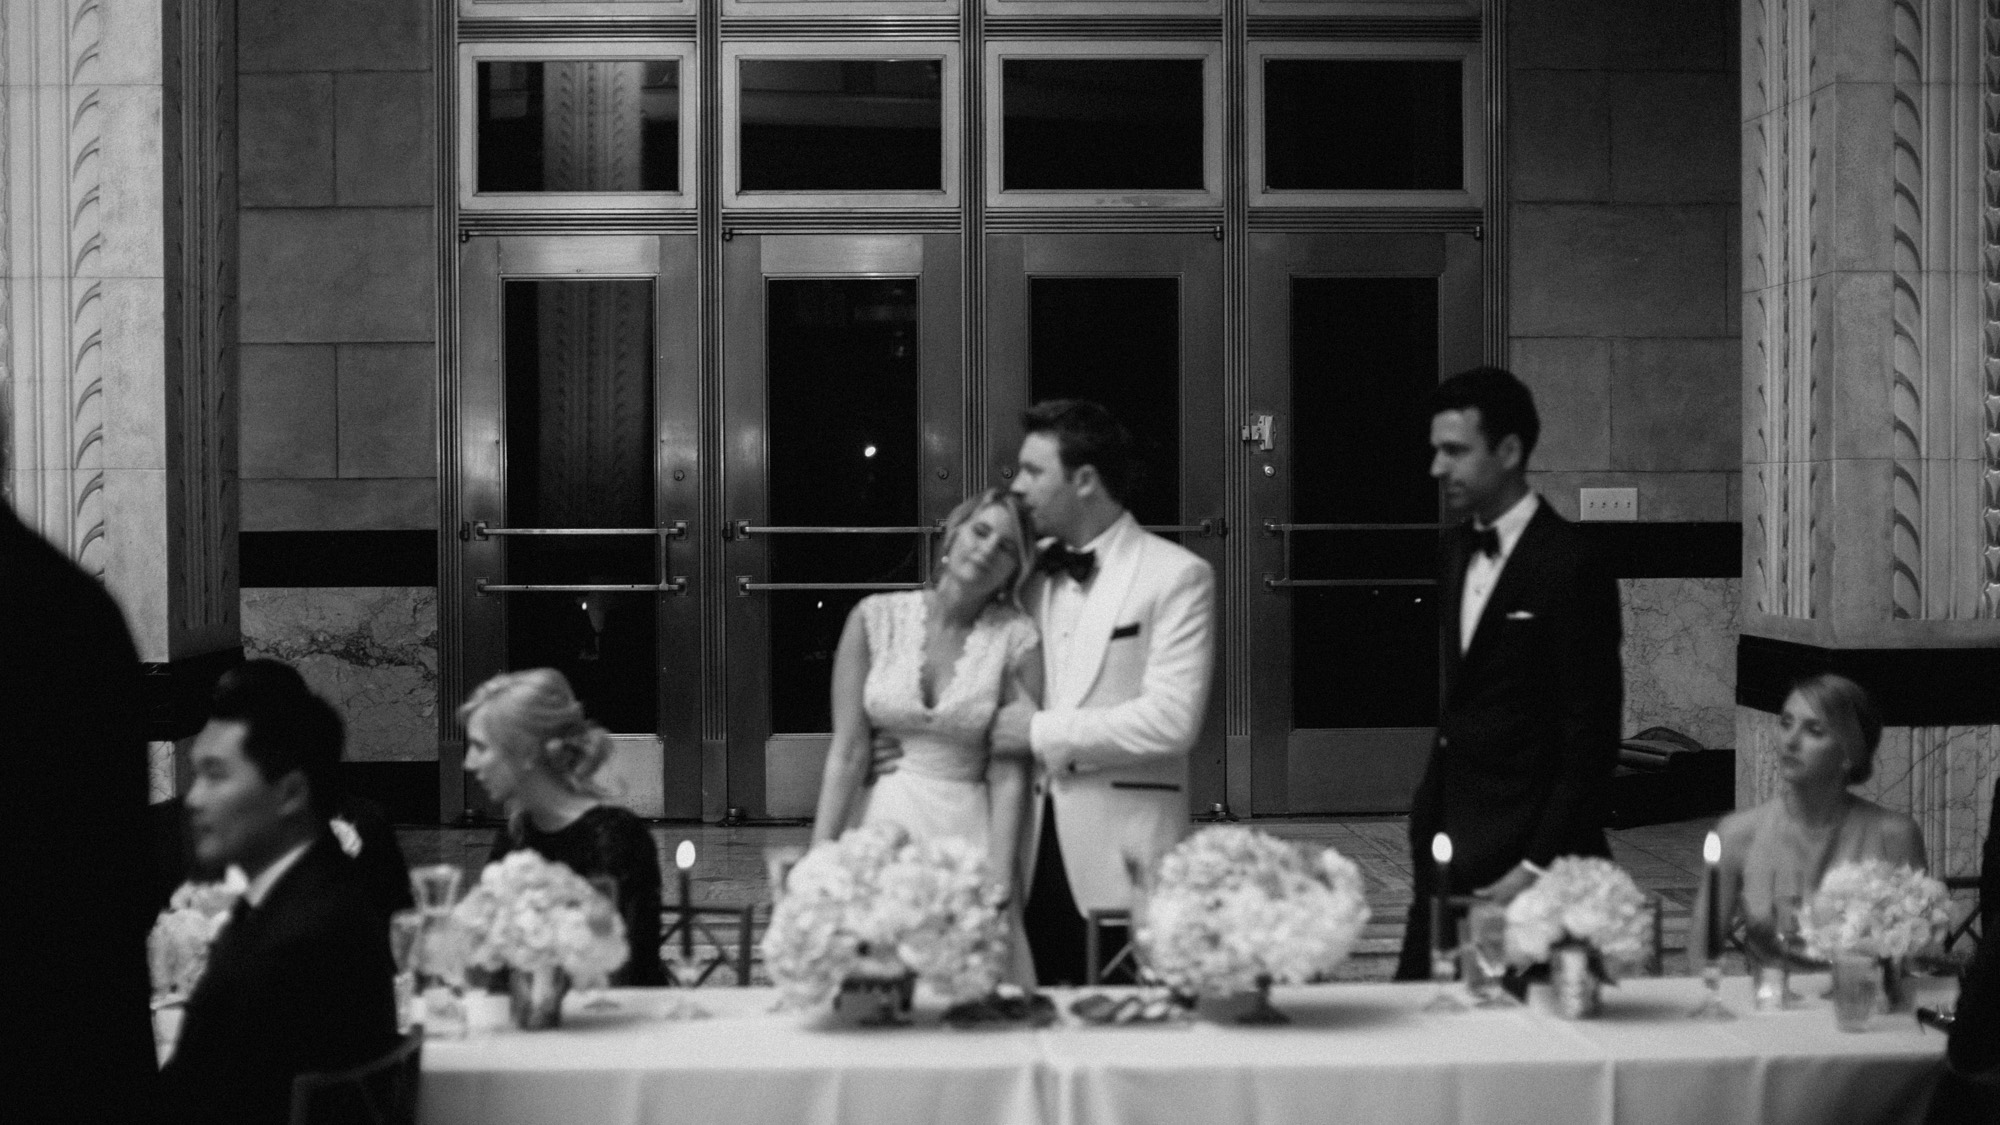 Alec_Vanderboom_kansas_city_hip_wedding_photos-0065.jpg